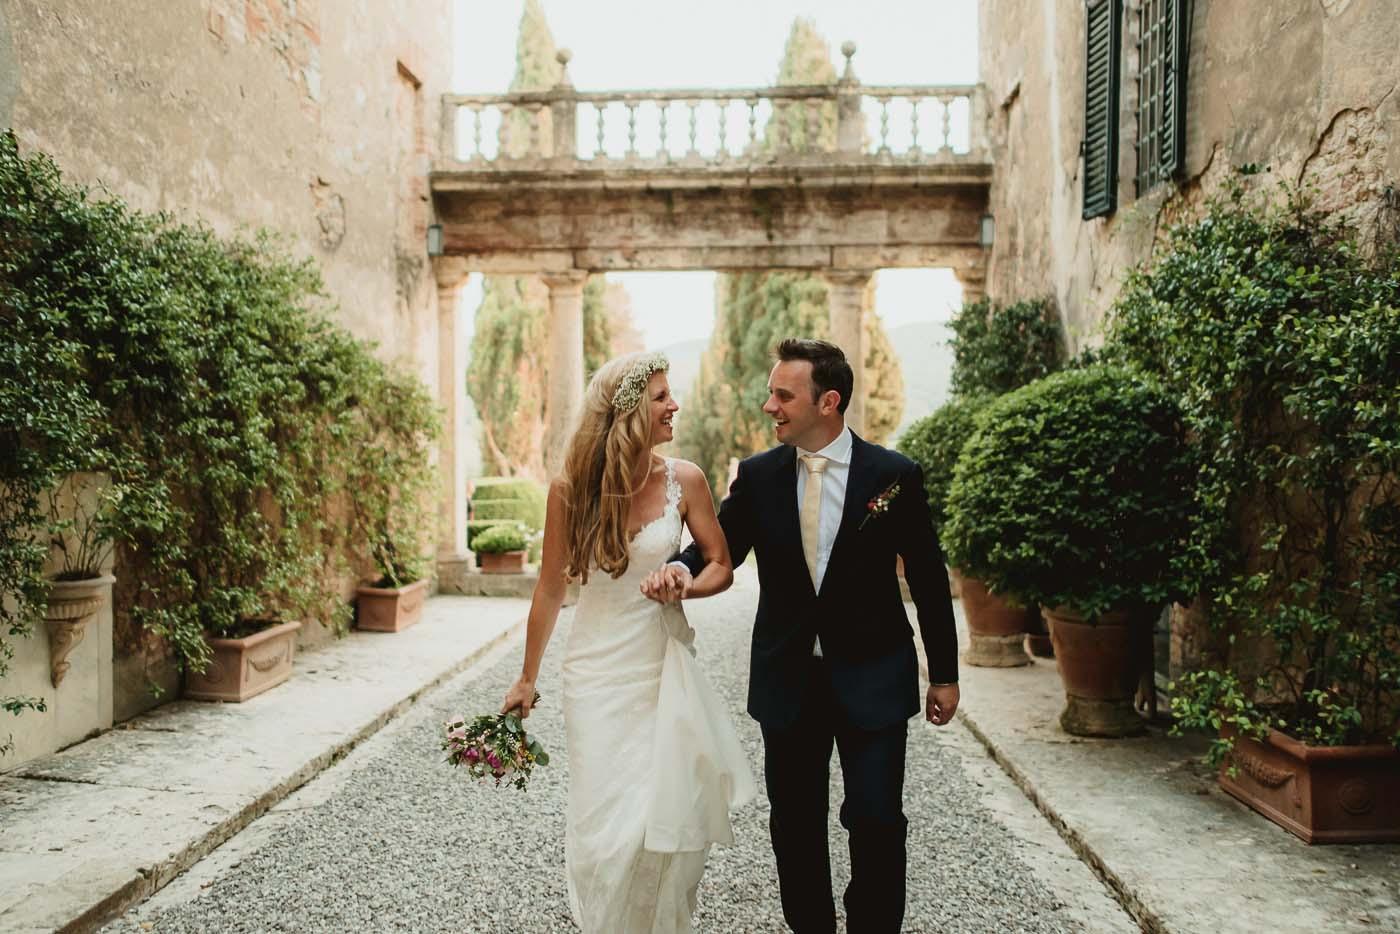 Relaxed-wedding-borgo-stomennano-1194